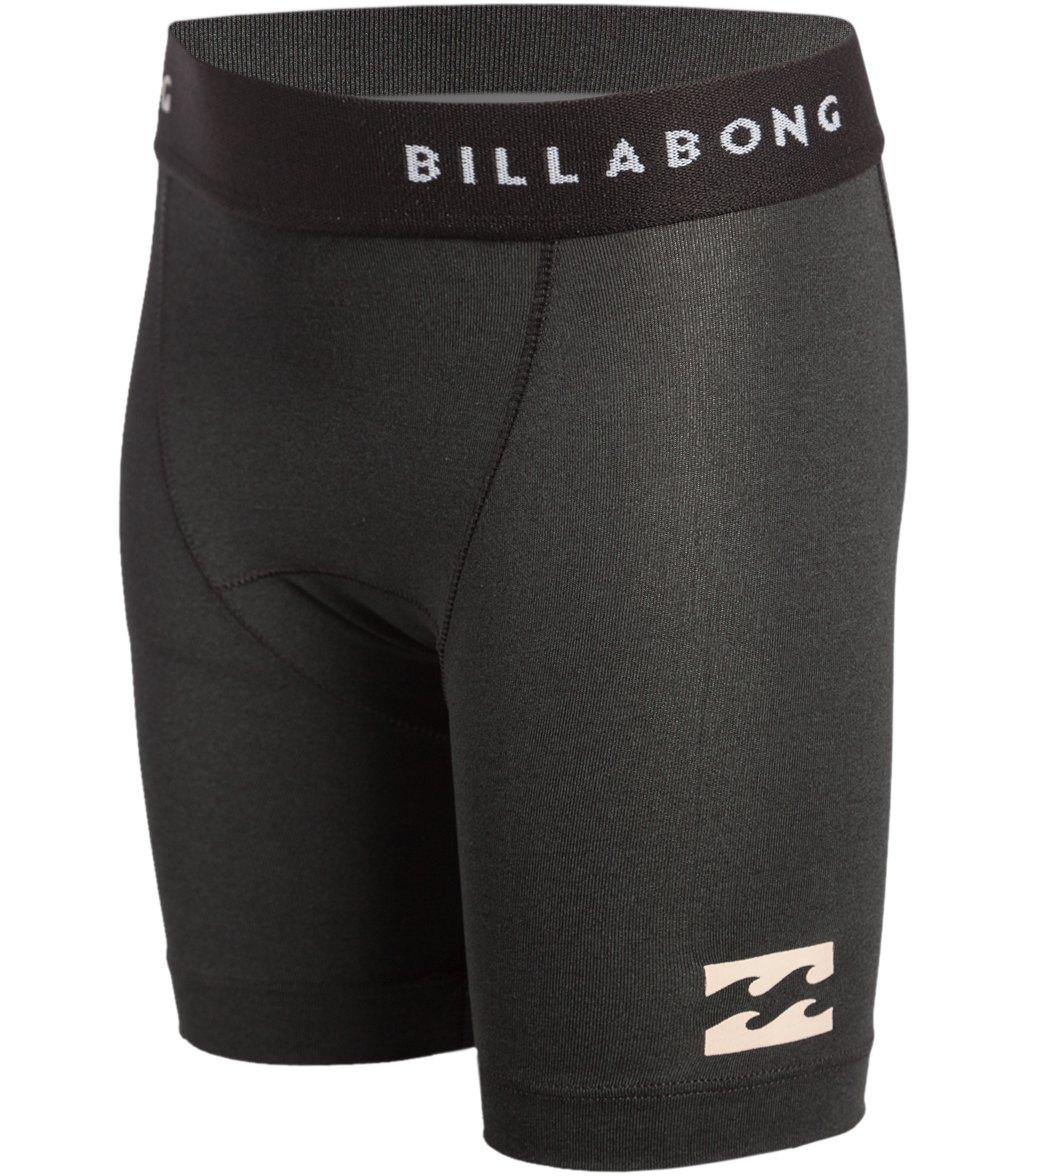 Billabong Boys  All Day Undershort at SwimOutlet.com 9492d2352